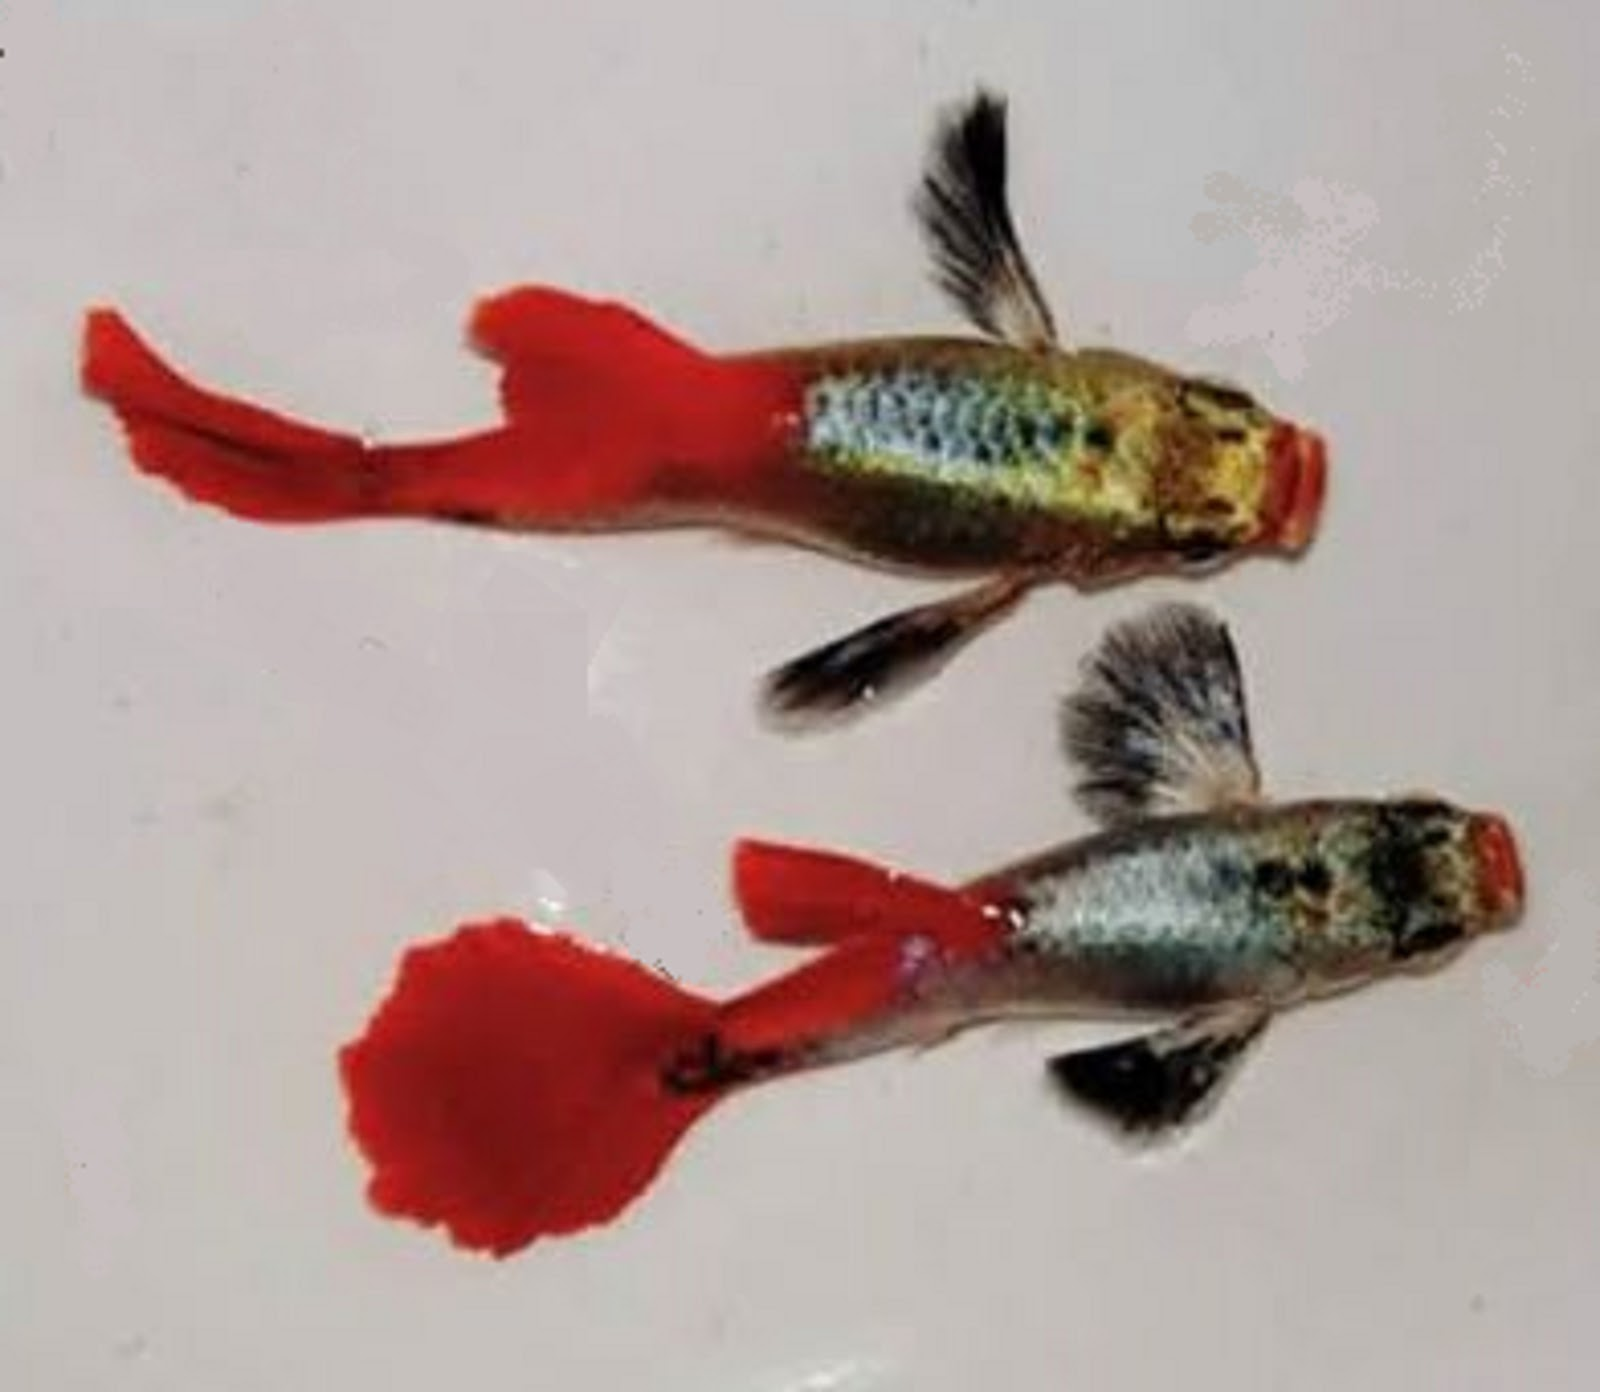 TOP BEAUTIFUL GUPPIES FISH COLLECTION FISH TANK AQUARIUM